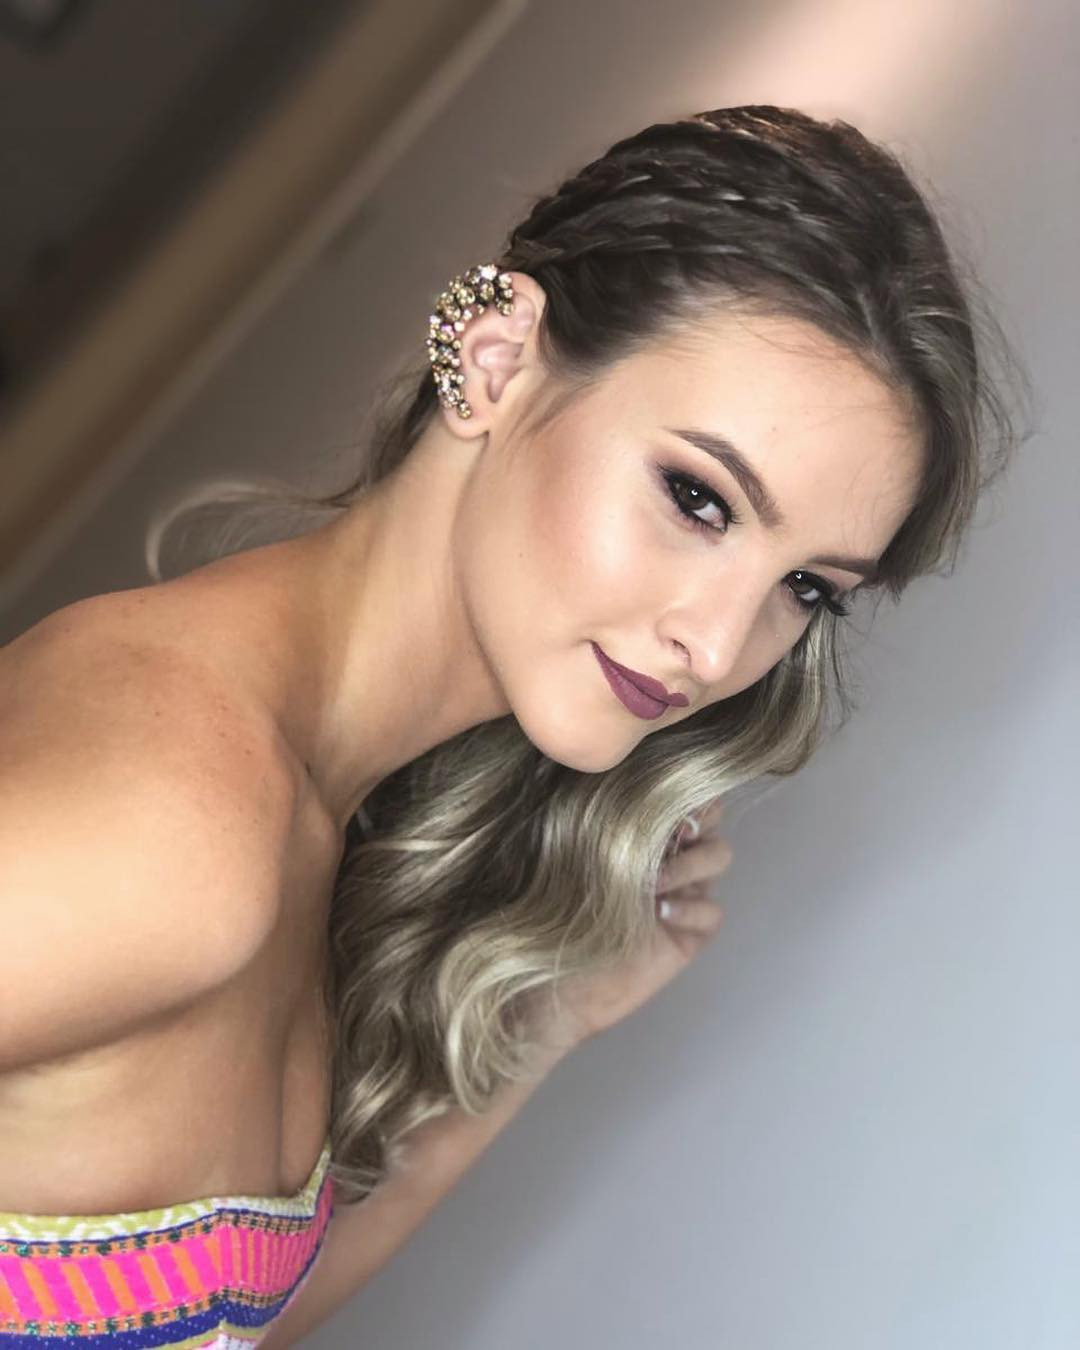 larissa neiverth, top 20 de miss brasil mundo 2019. - Página 3 Qgezj910